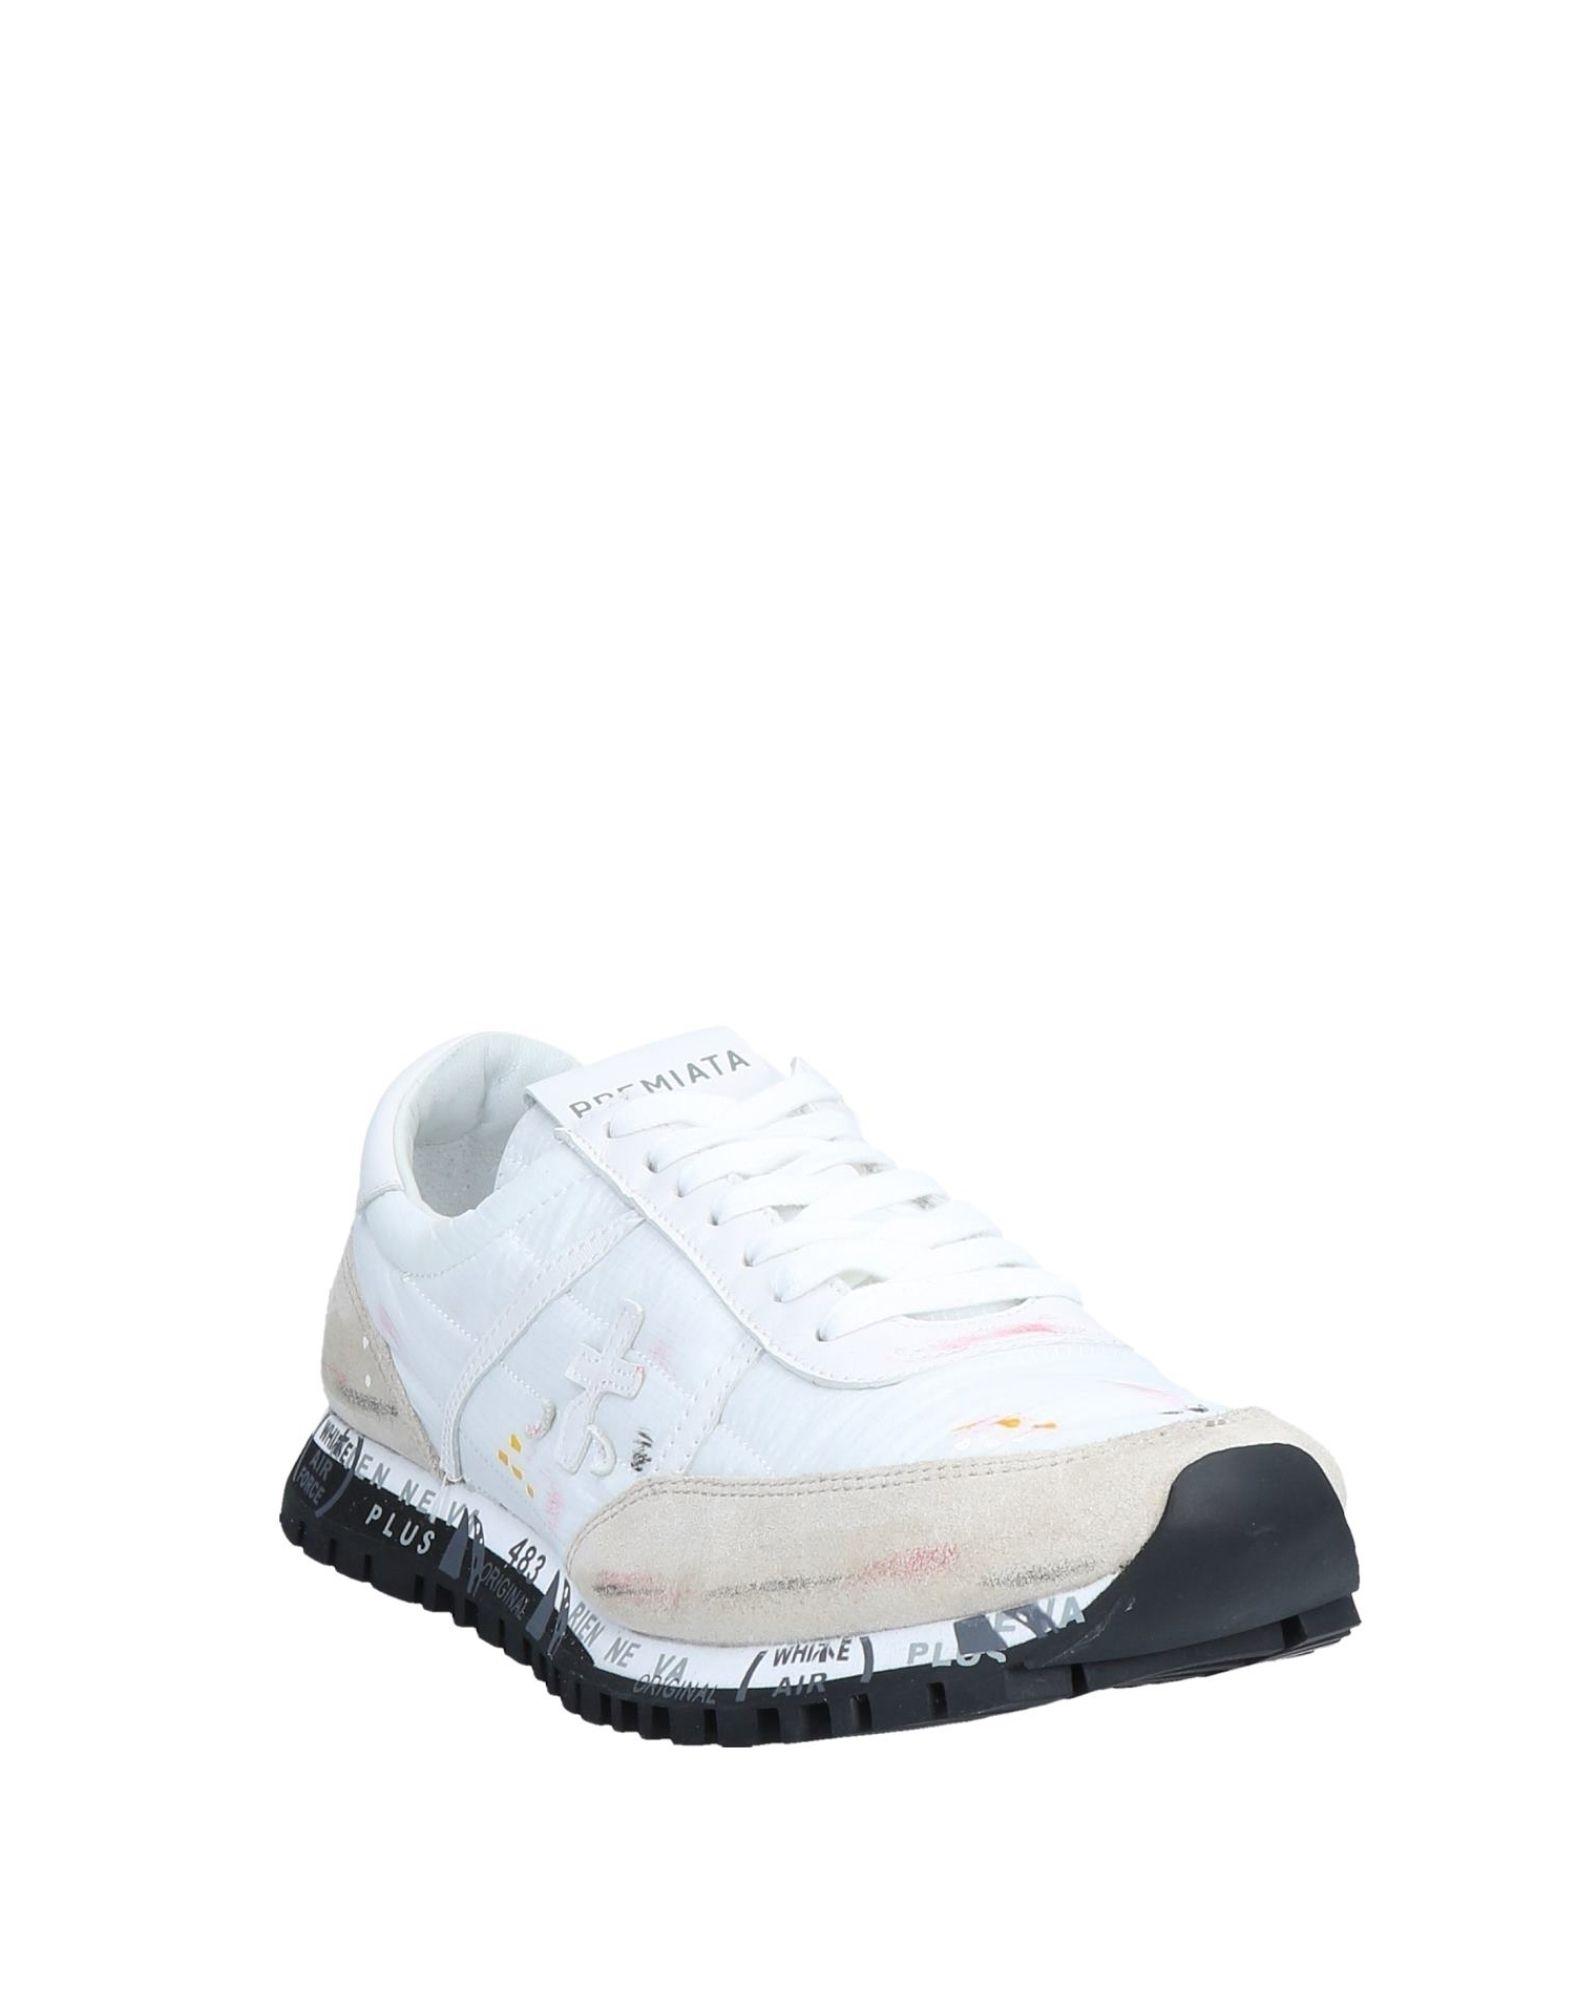 0c3a3497e36 PREMIATA ΠΑΠΟΥΤΣΙΑ Παπούτσια τένις χαμηλά, Γυναικεία παπούτσια τέννις,  ΓΥΝΑΙΚΑ | ΠΑΠΟΥΤΣΙΑ | ΤΕΝΝΙΣ